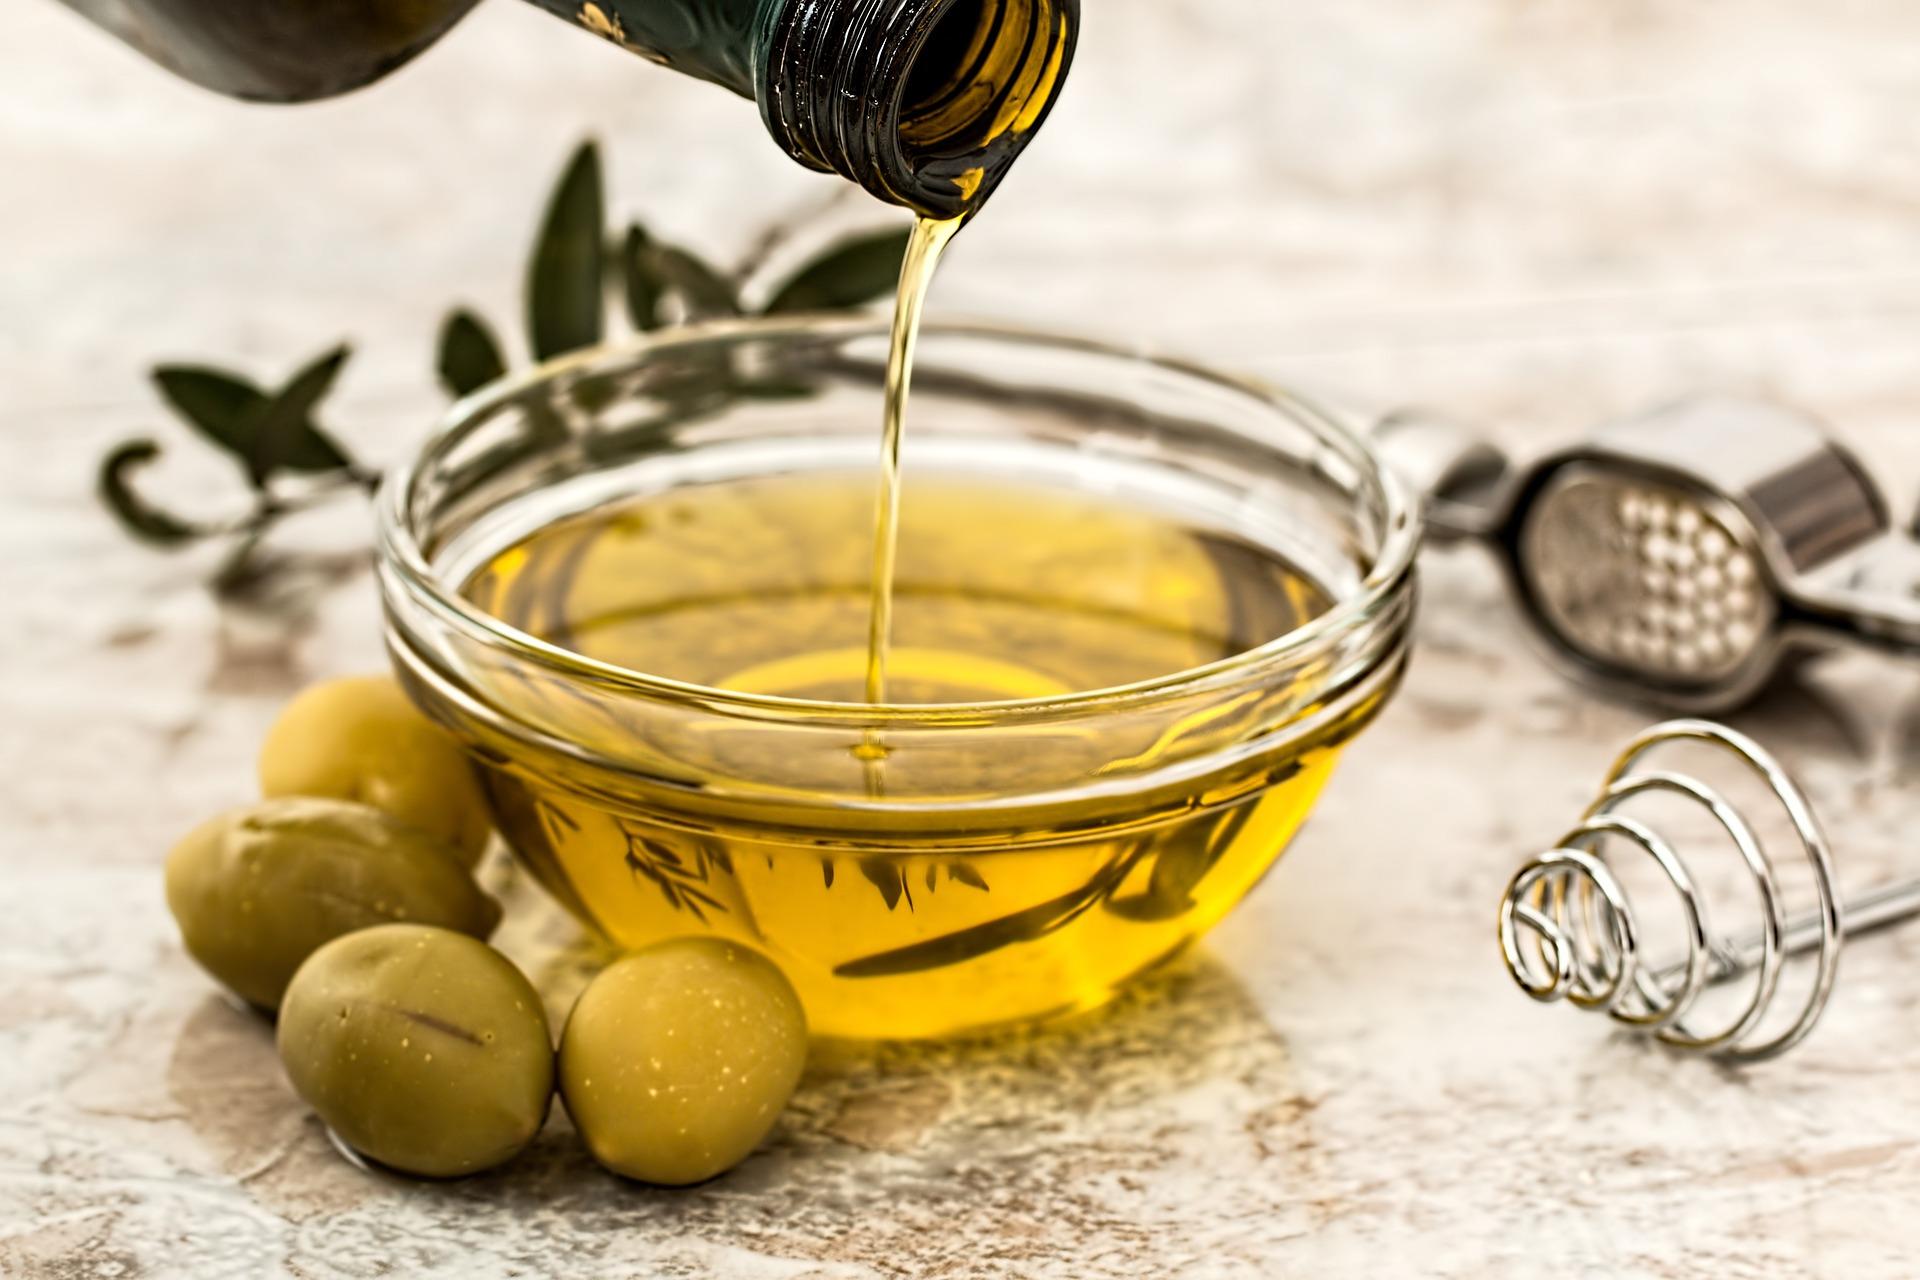 2 Tbsp Olive Oil